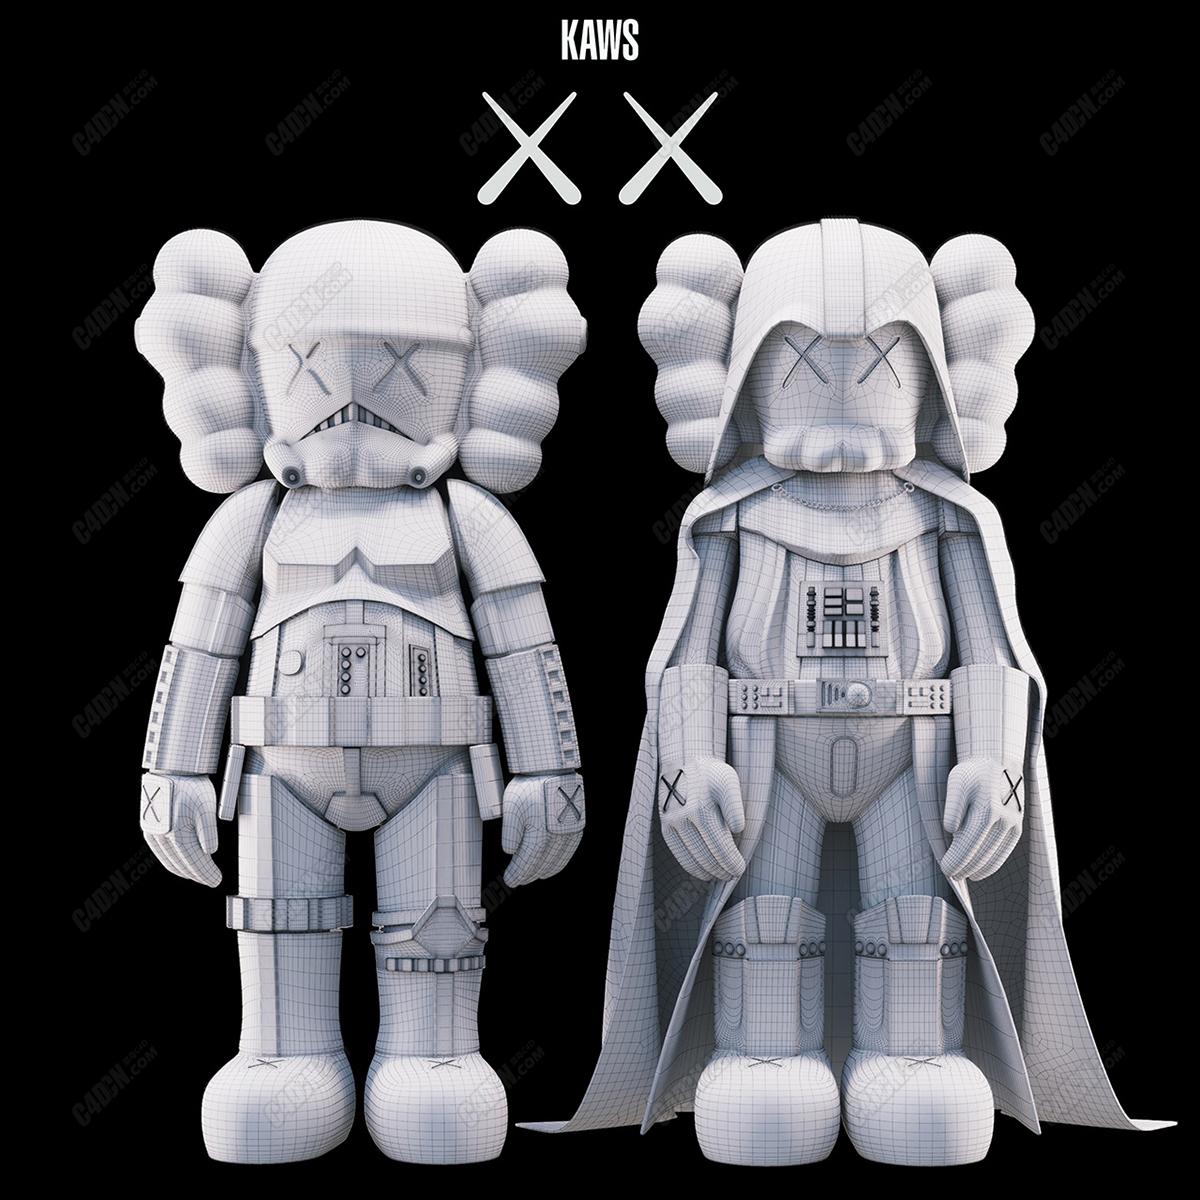 C4D卡通雕塑KAWS突击队员玩偶模型